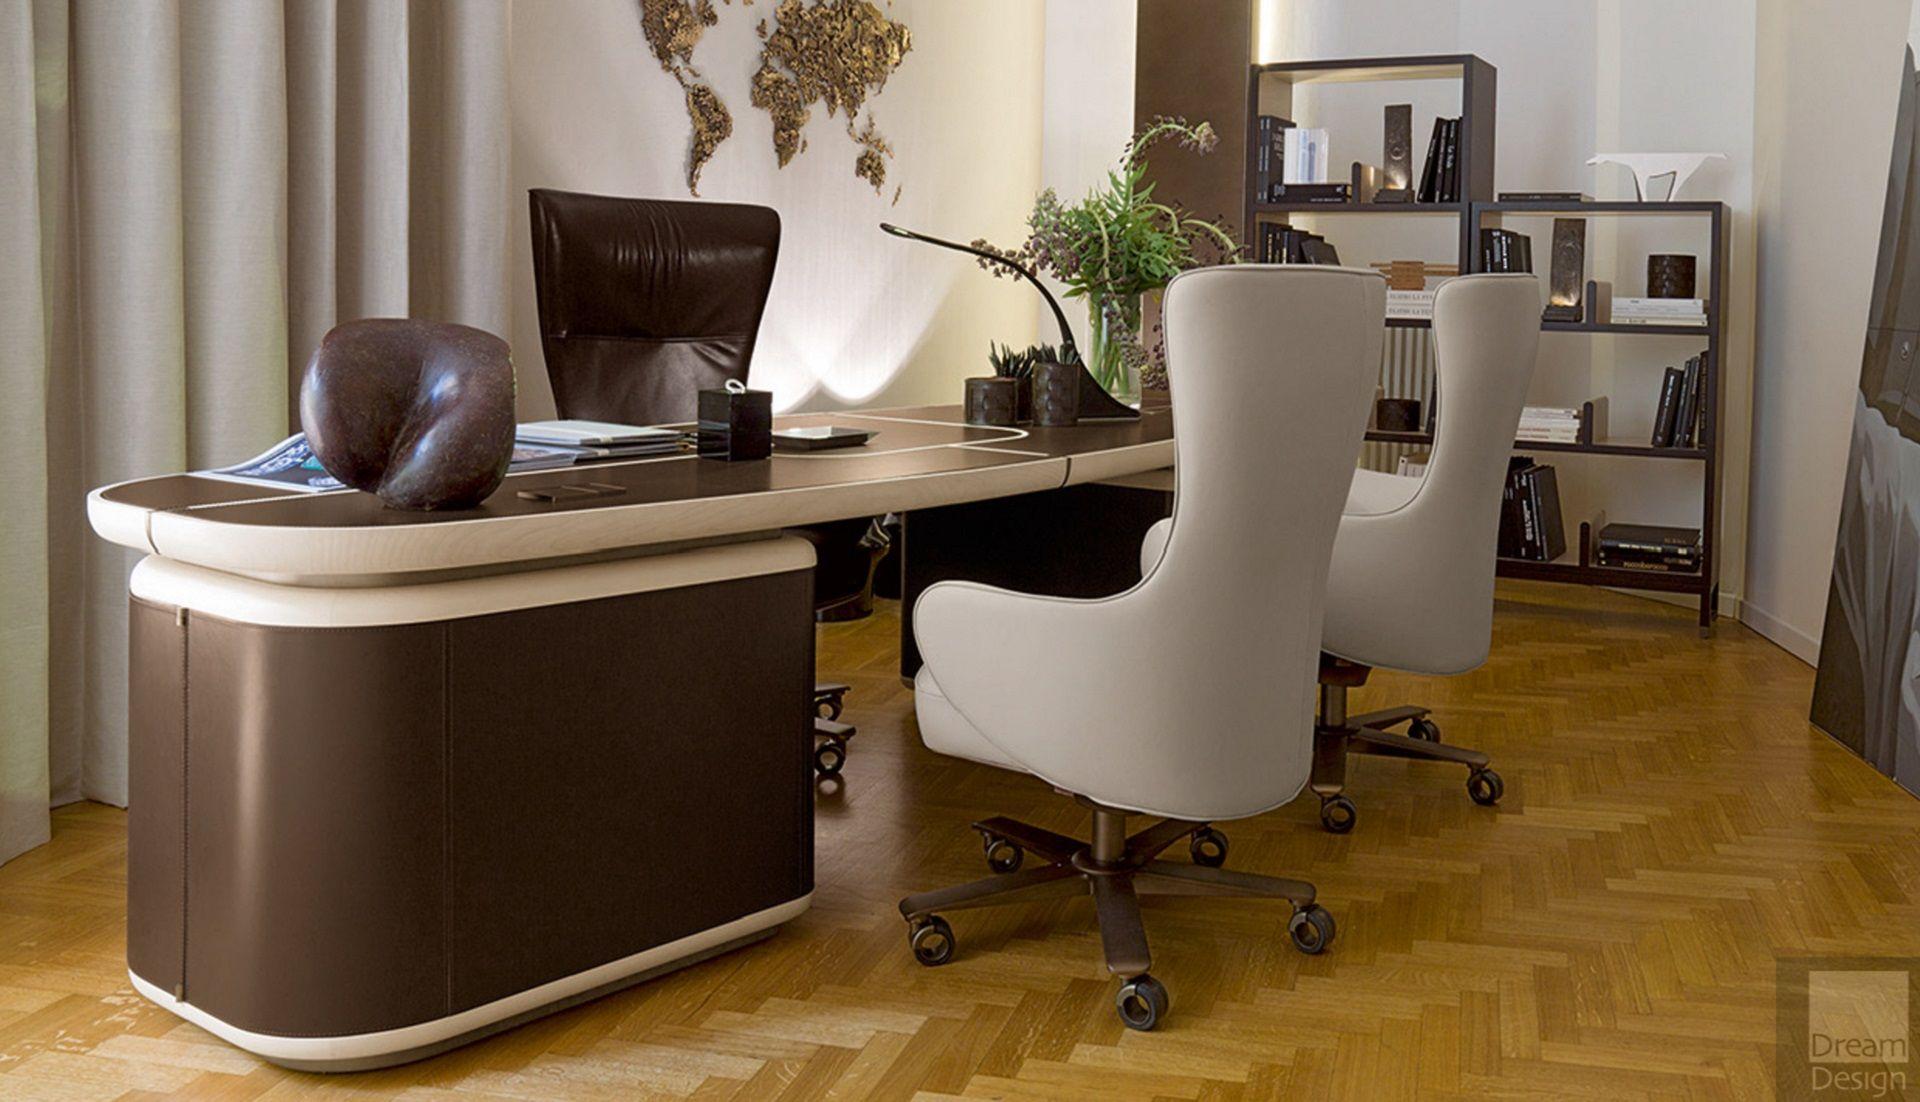 Tycoon Desk Furniture, Geometric decor, Desk